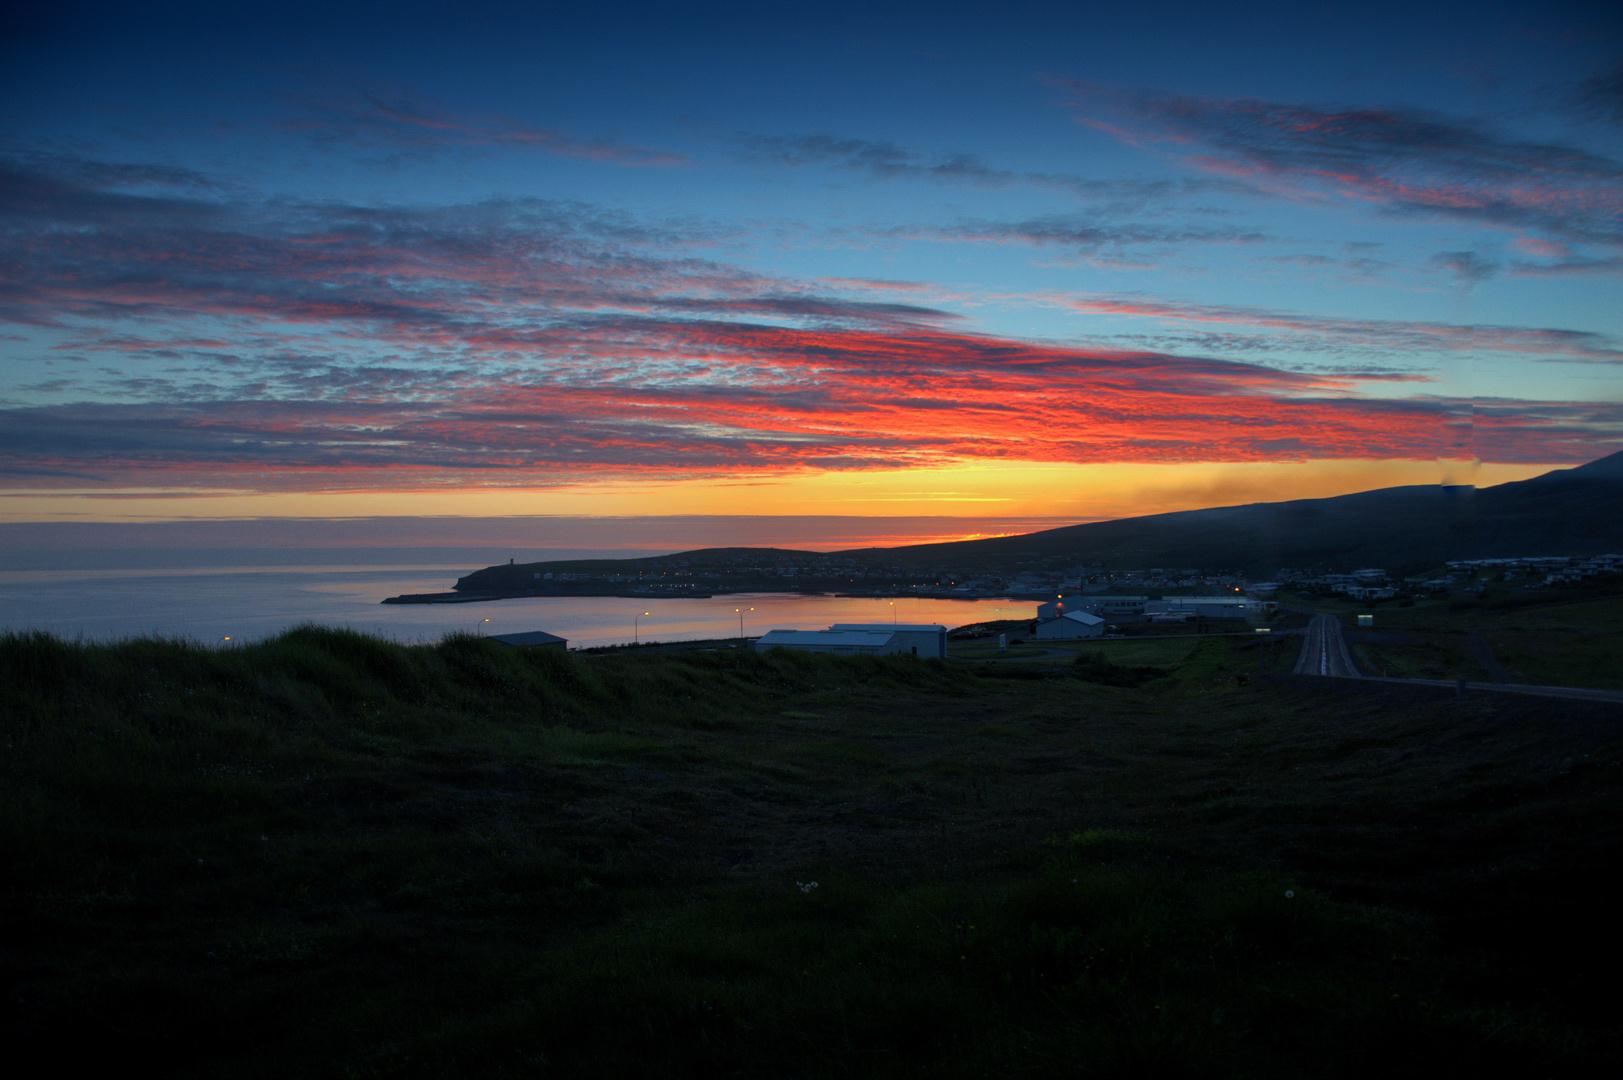 Húsavík in july at 2:00 AM